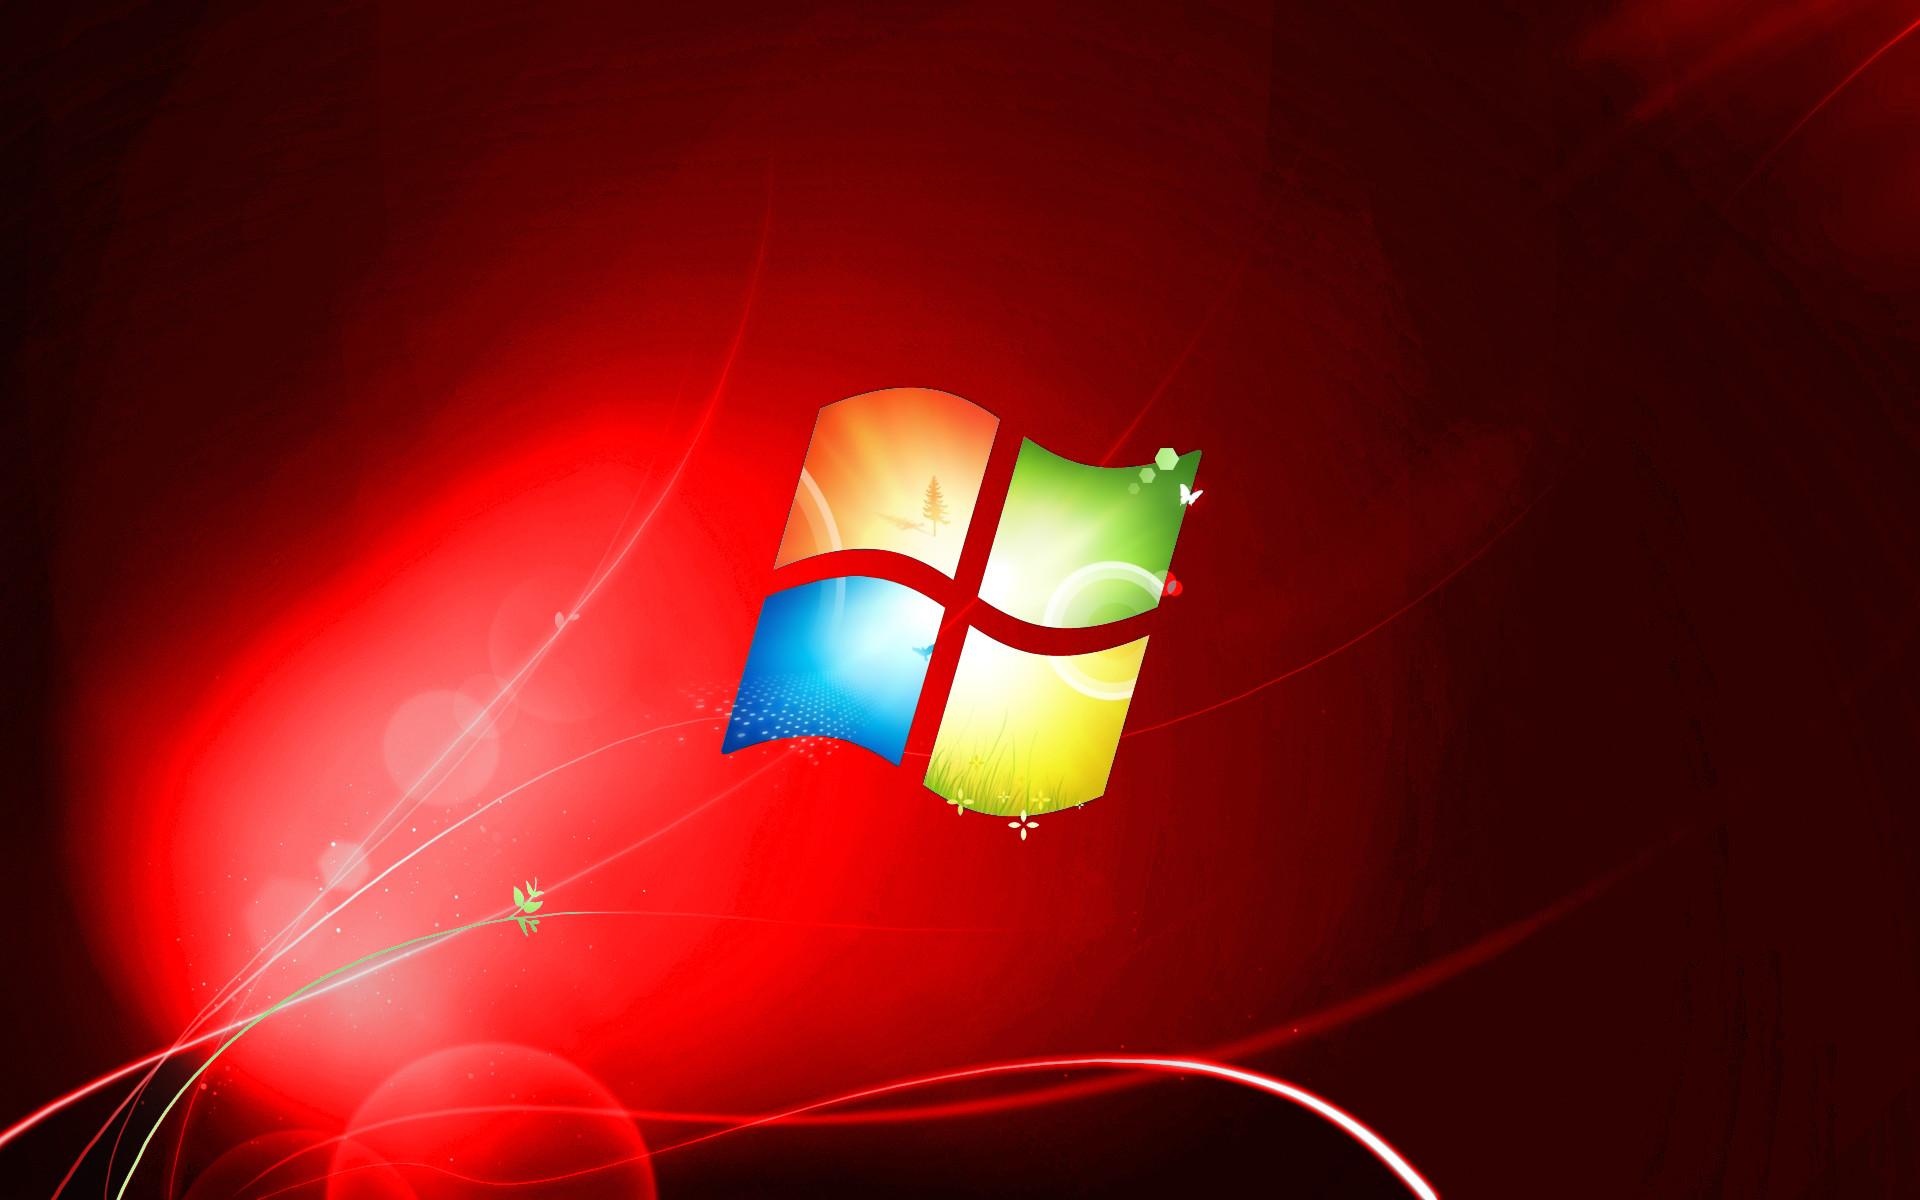 Naruto Backgrounds Download Desktop Wallpapers   Windows 7 1920x1200